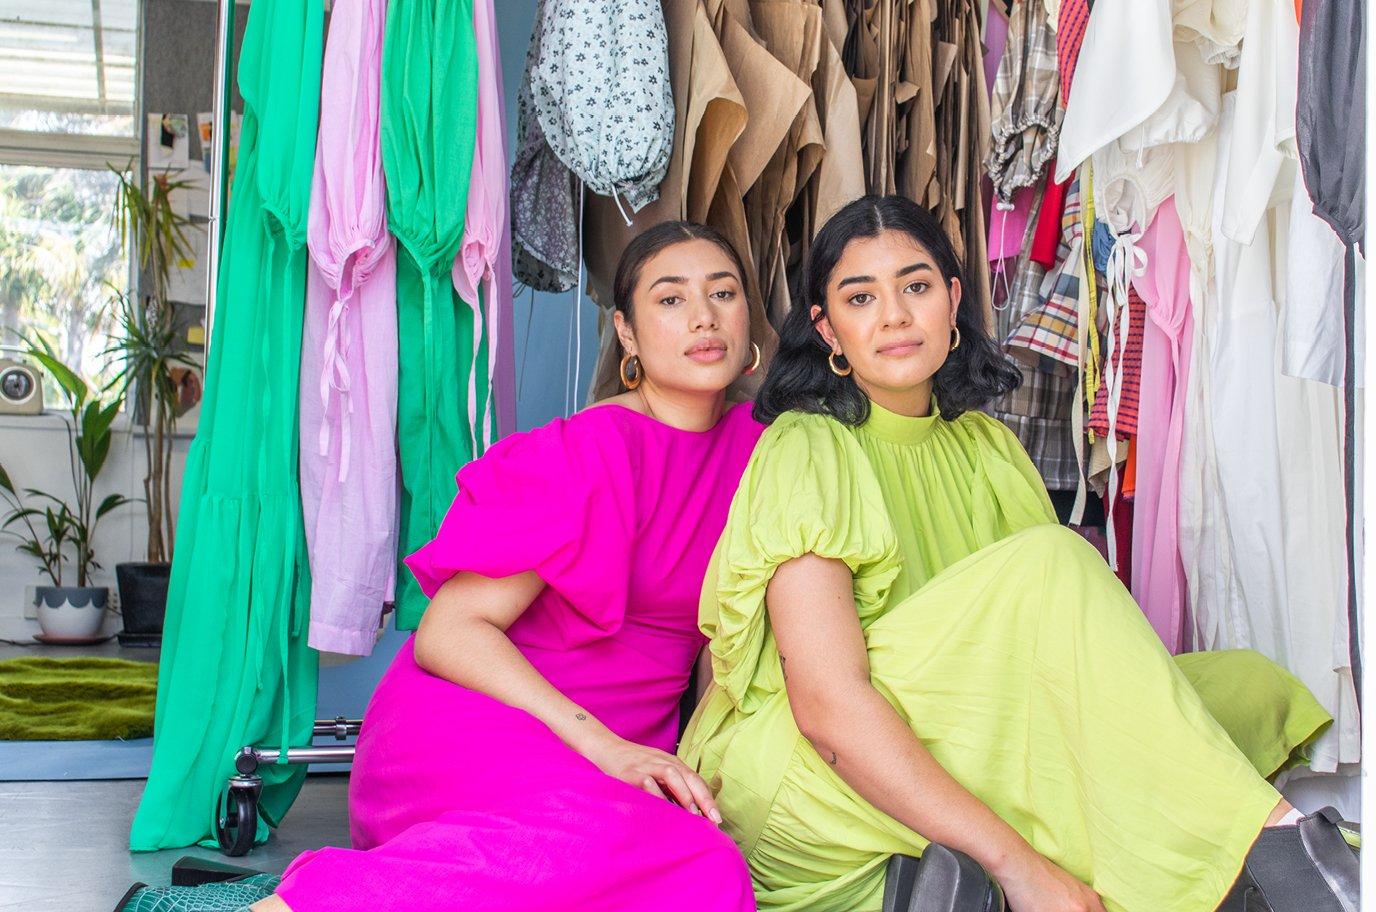 LAYPLAN: The Pasifika designer duo taking Aotearoa's fashion scene by storm